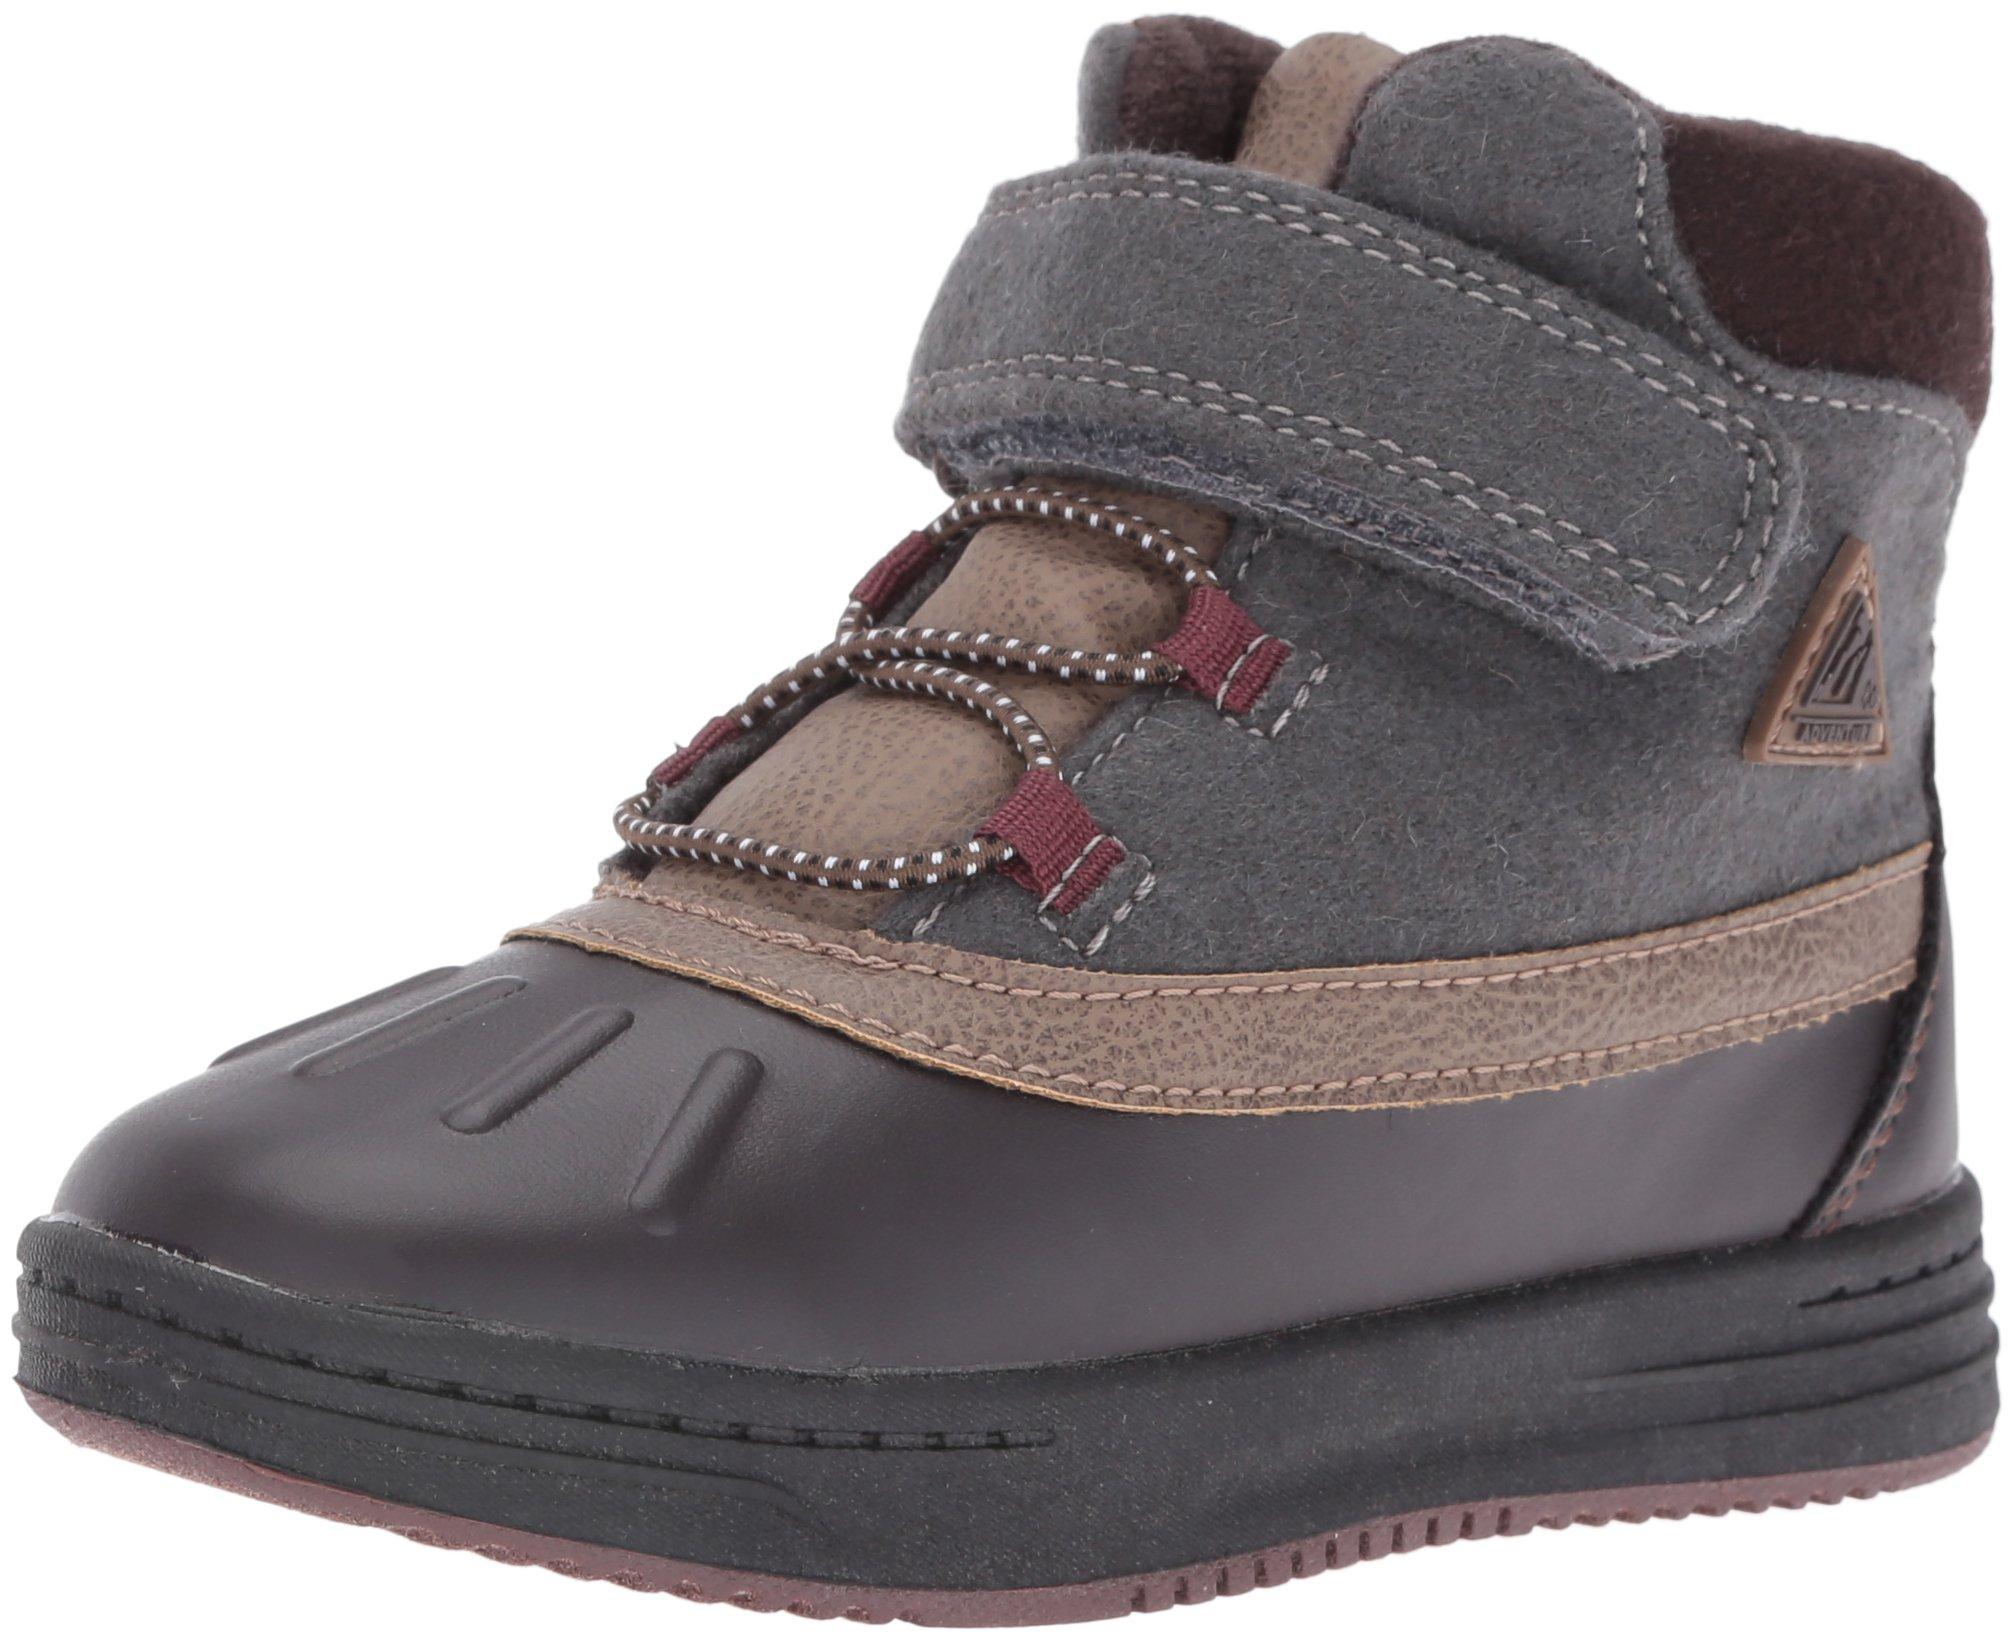 Burgundy Toddler Shoes: Amazon.com